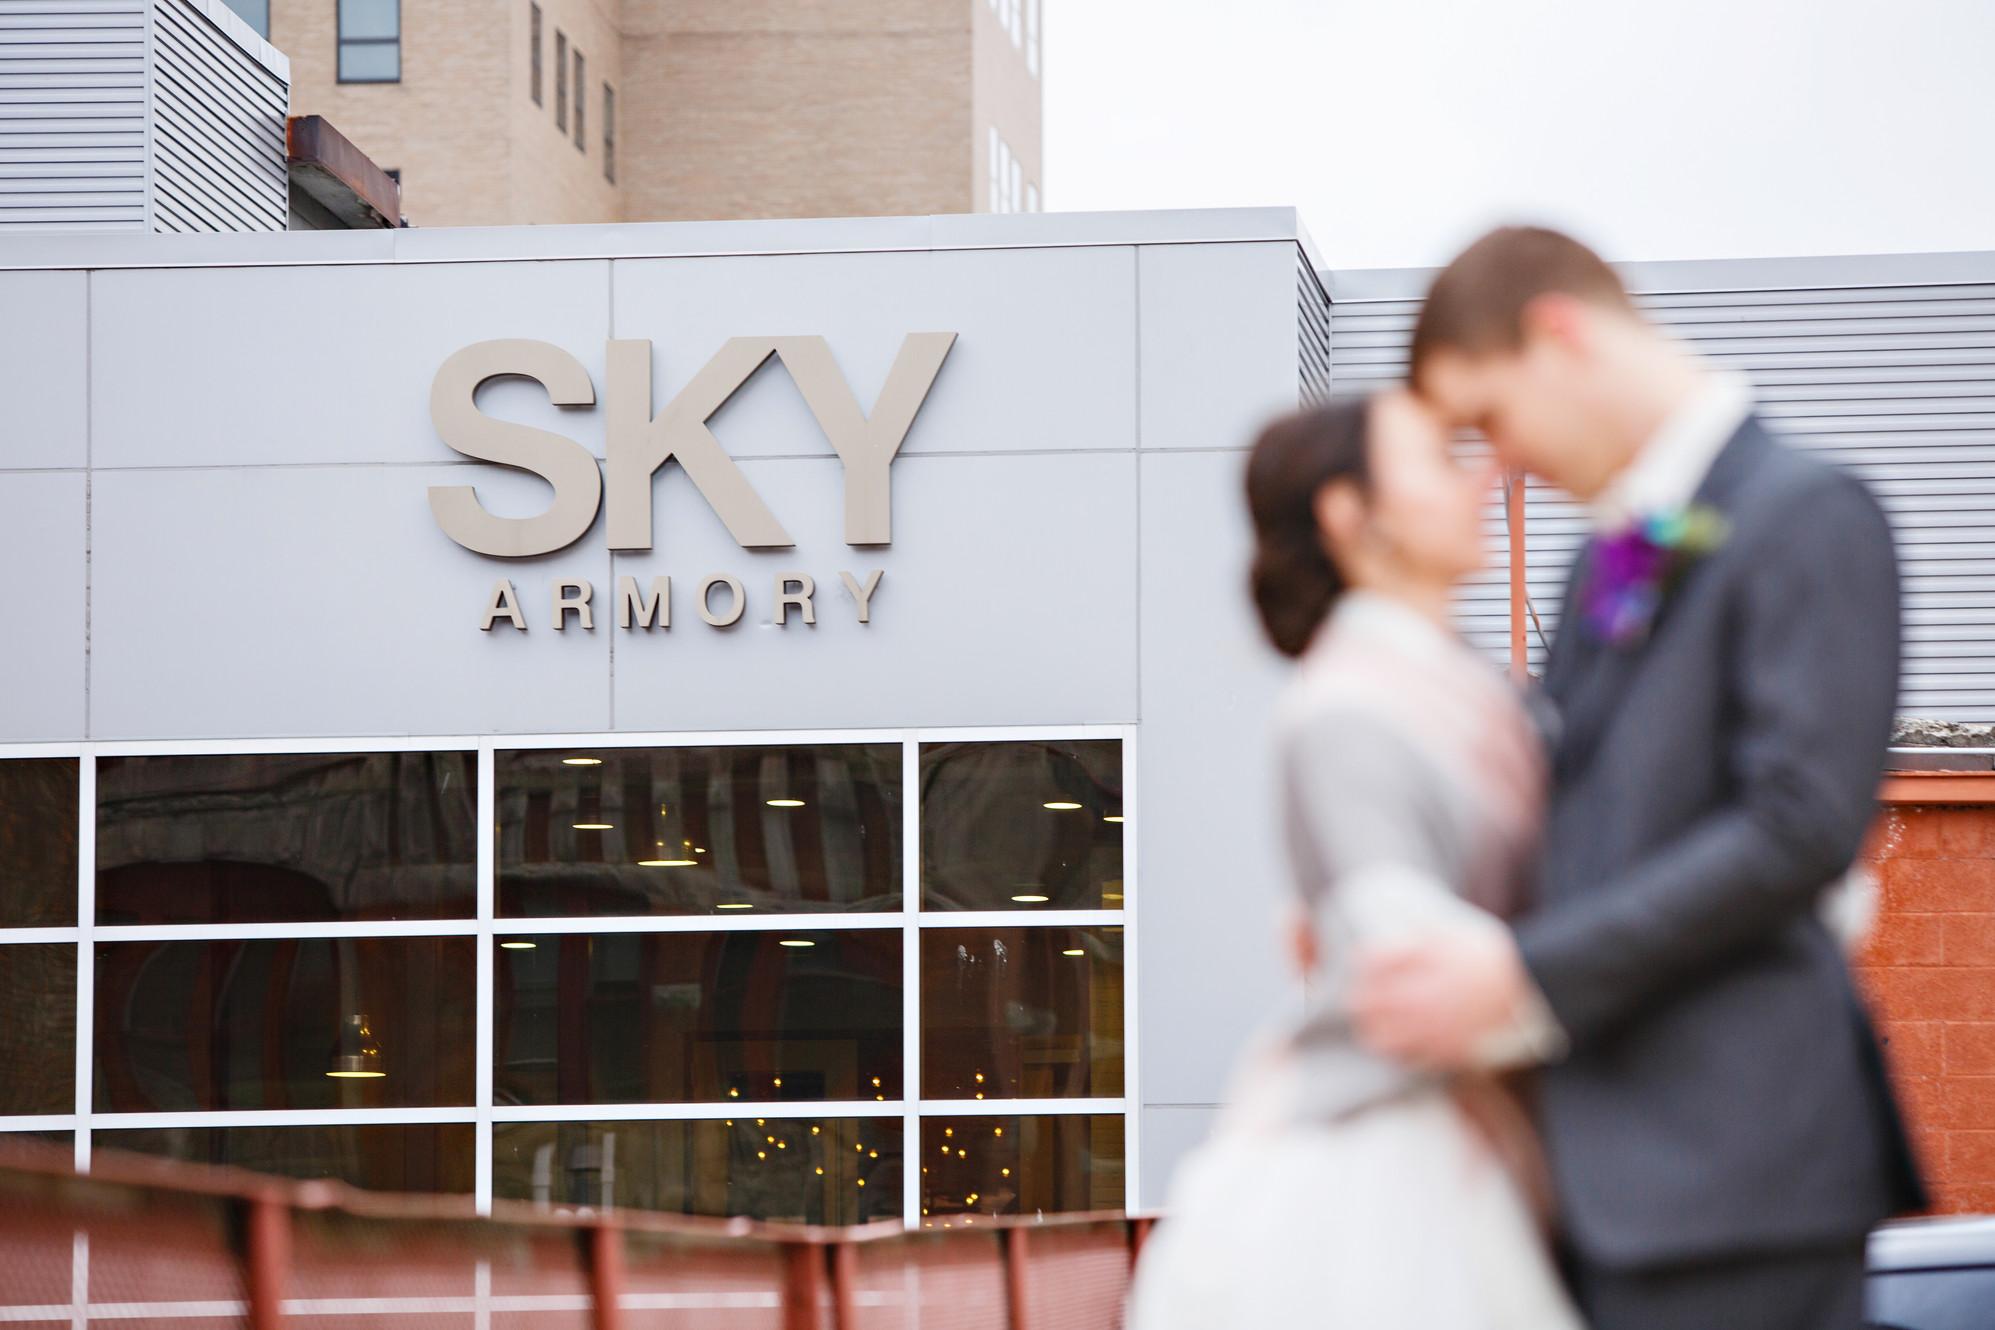 Wedding Venue Syracuse   SKY Armory   United States